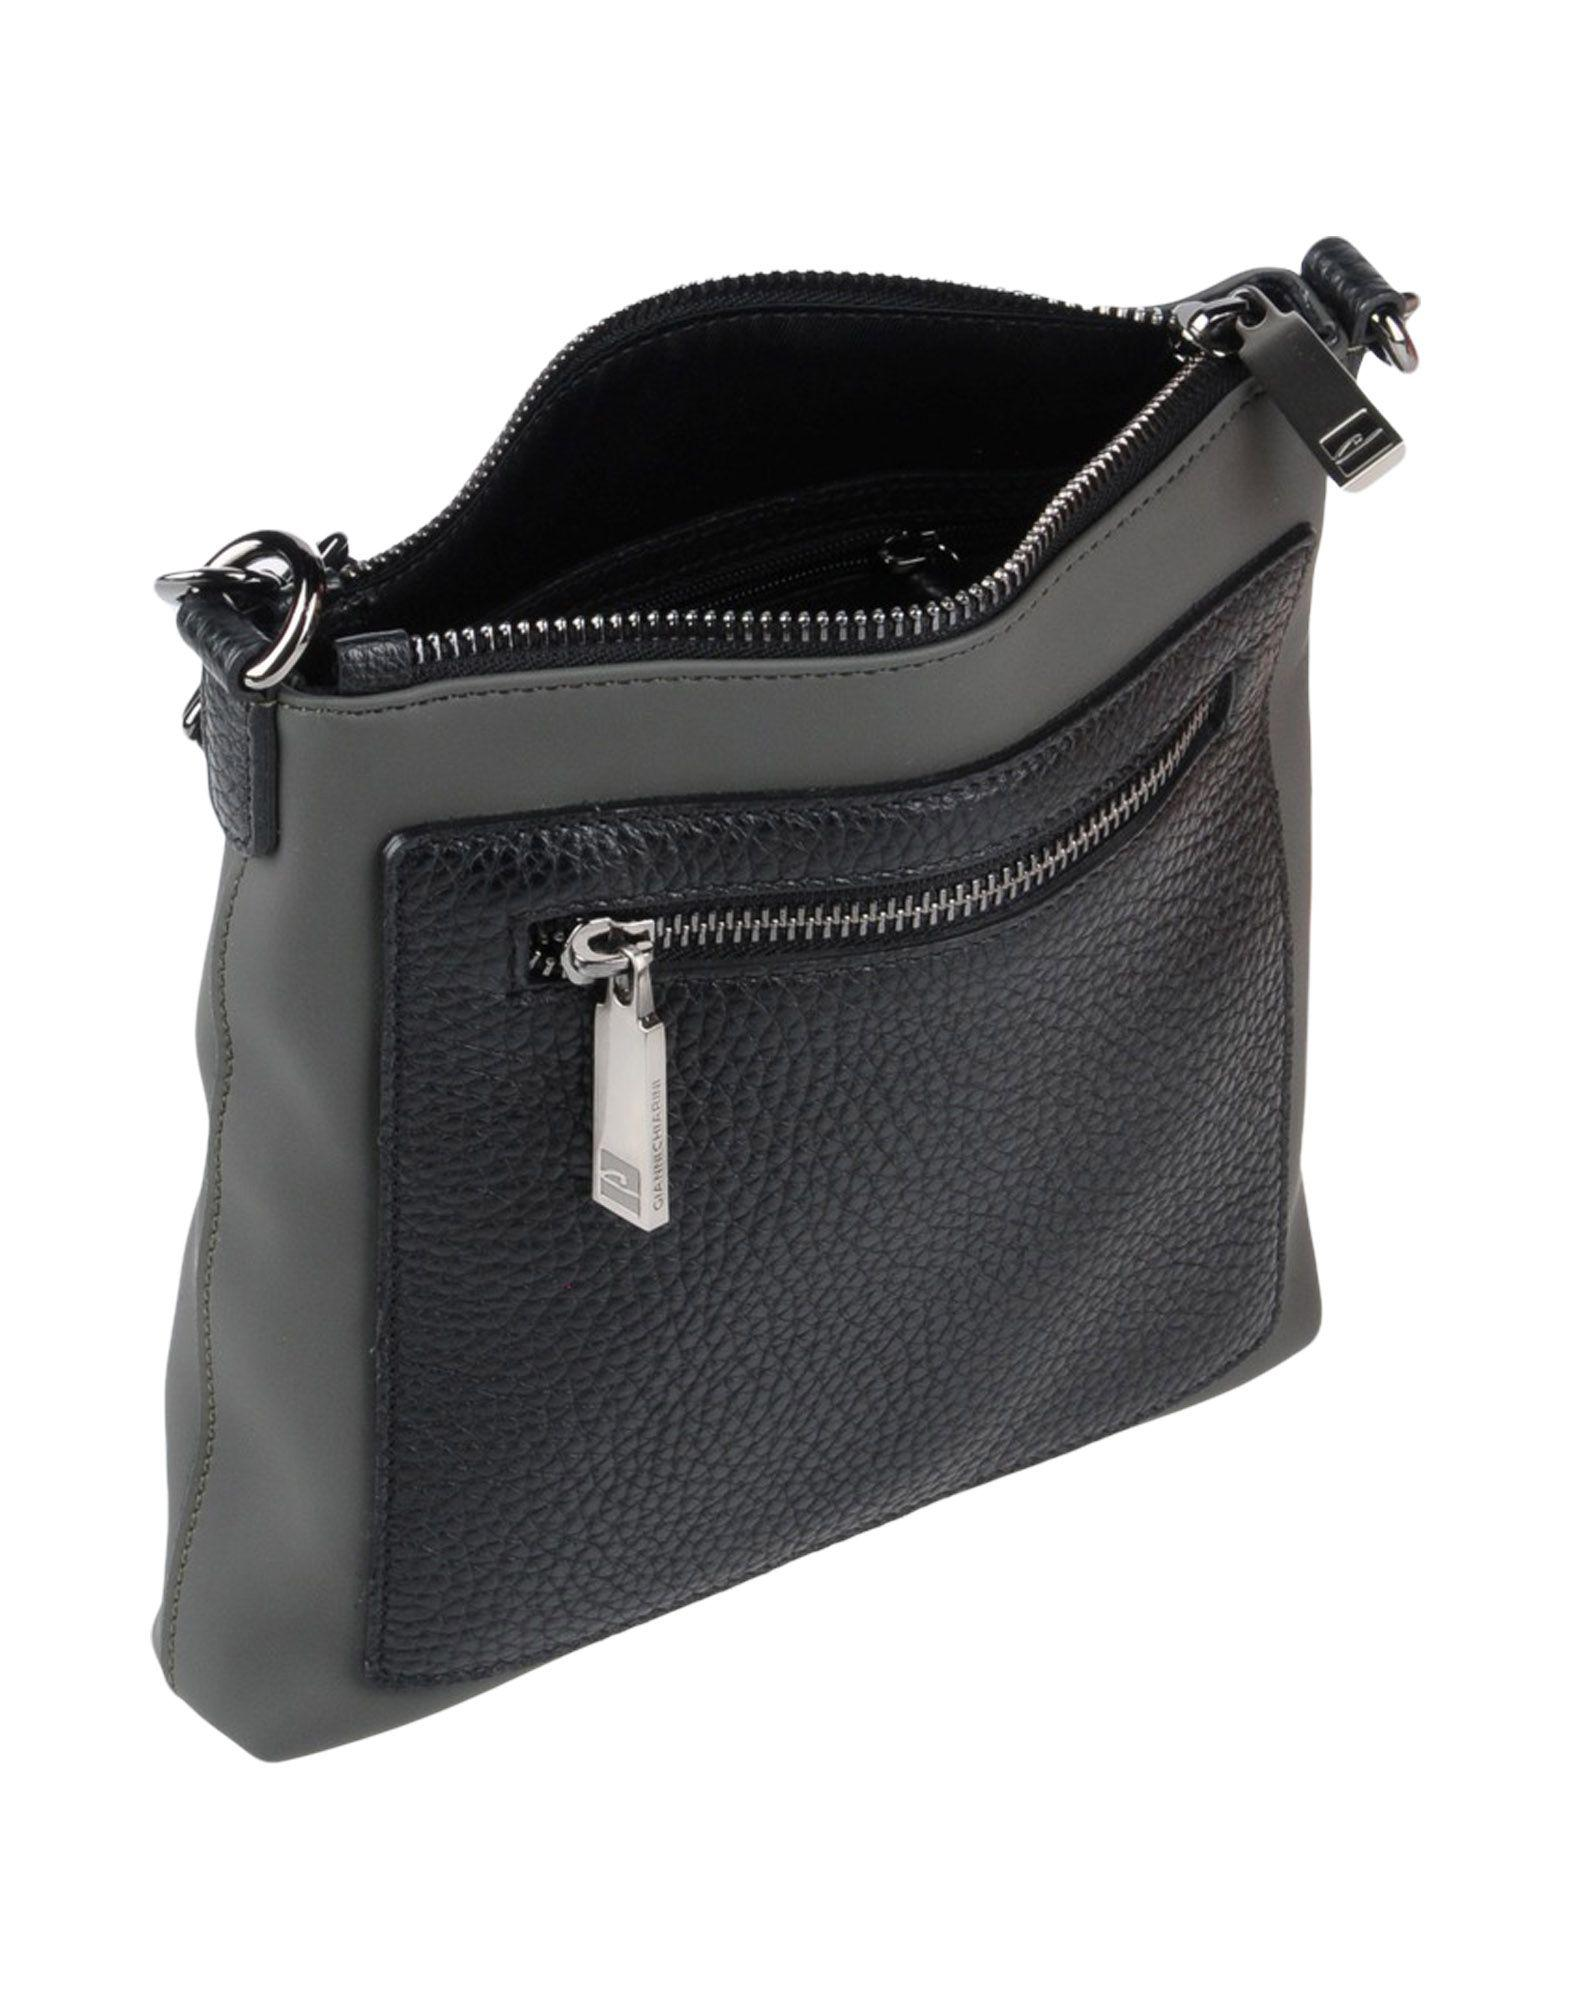 Gianni Chiarini Leather Cross-body Bag in Black for Men